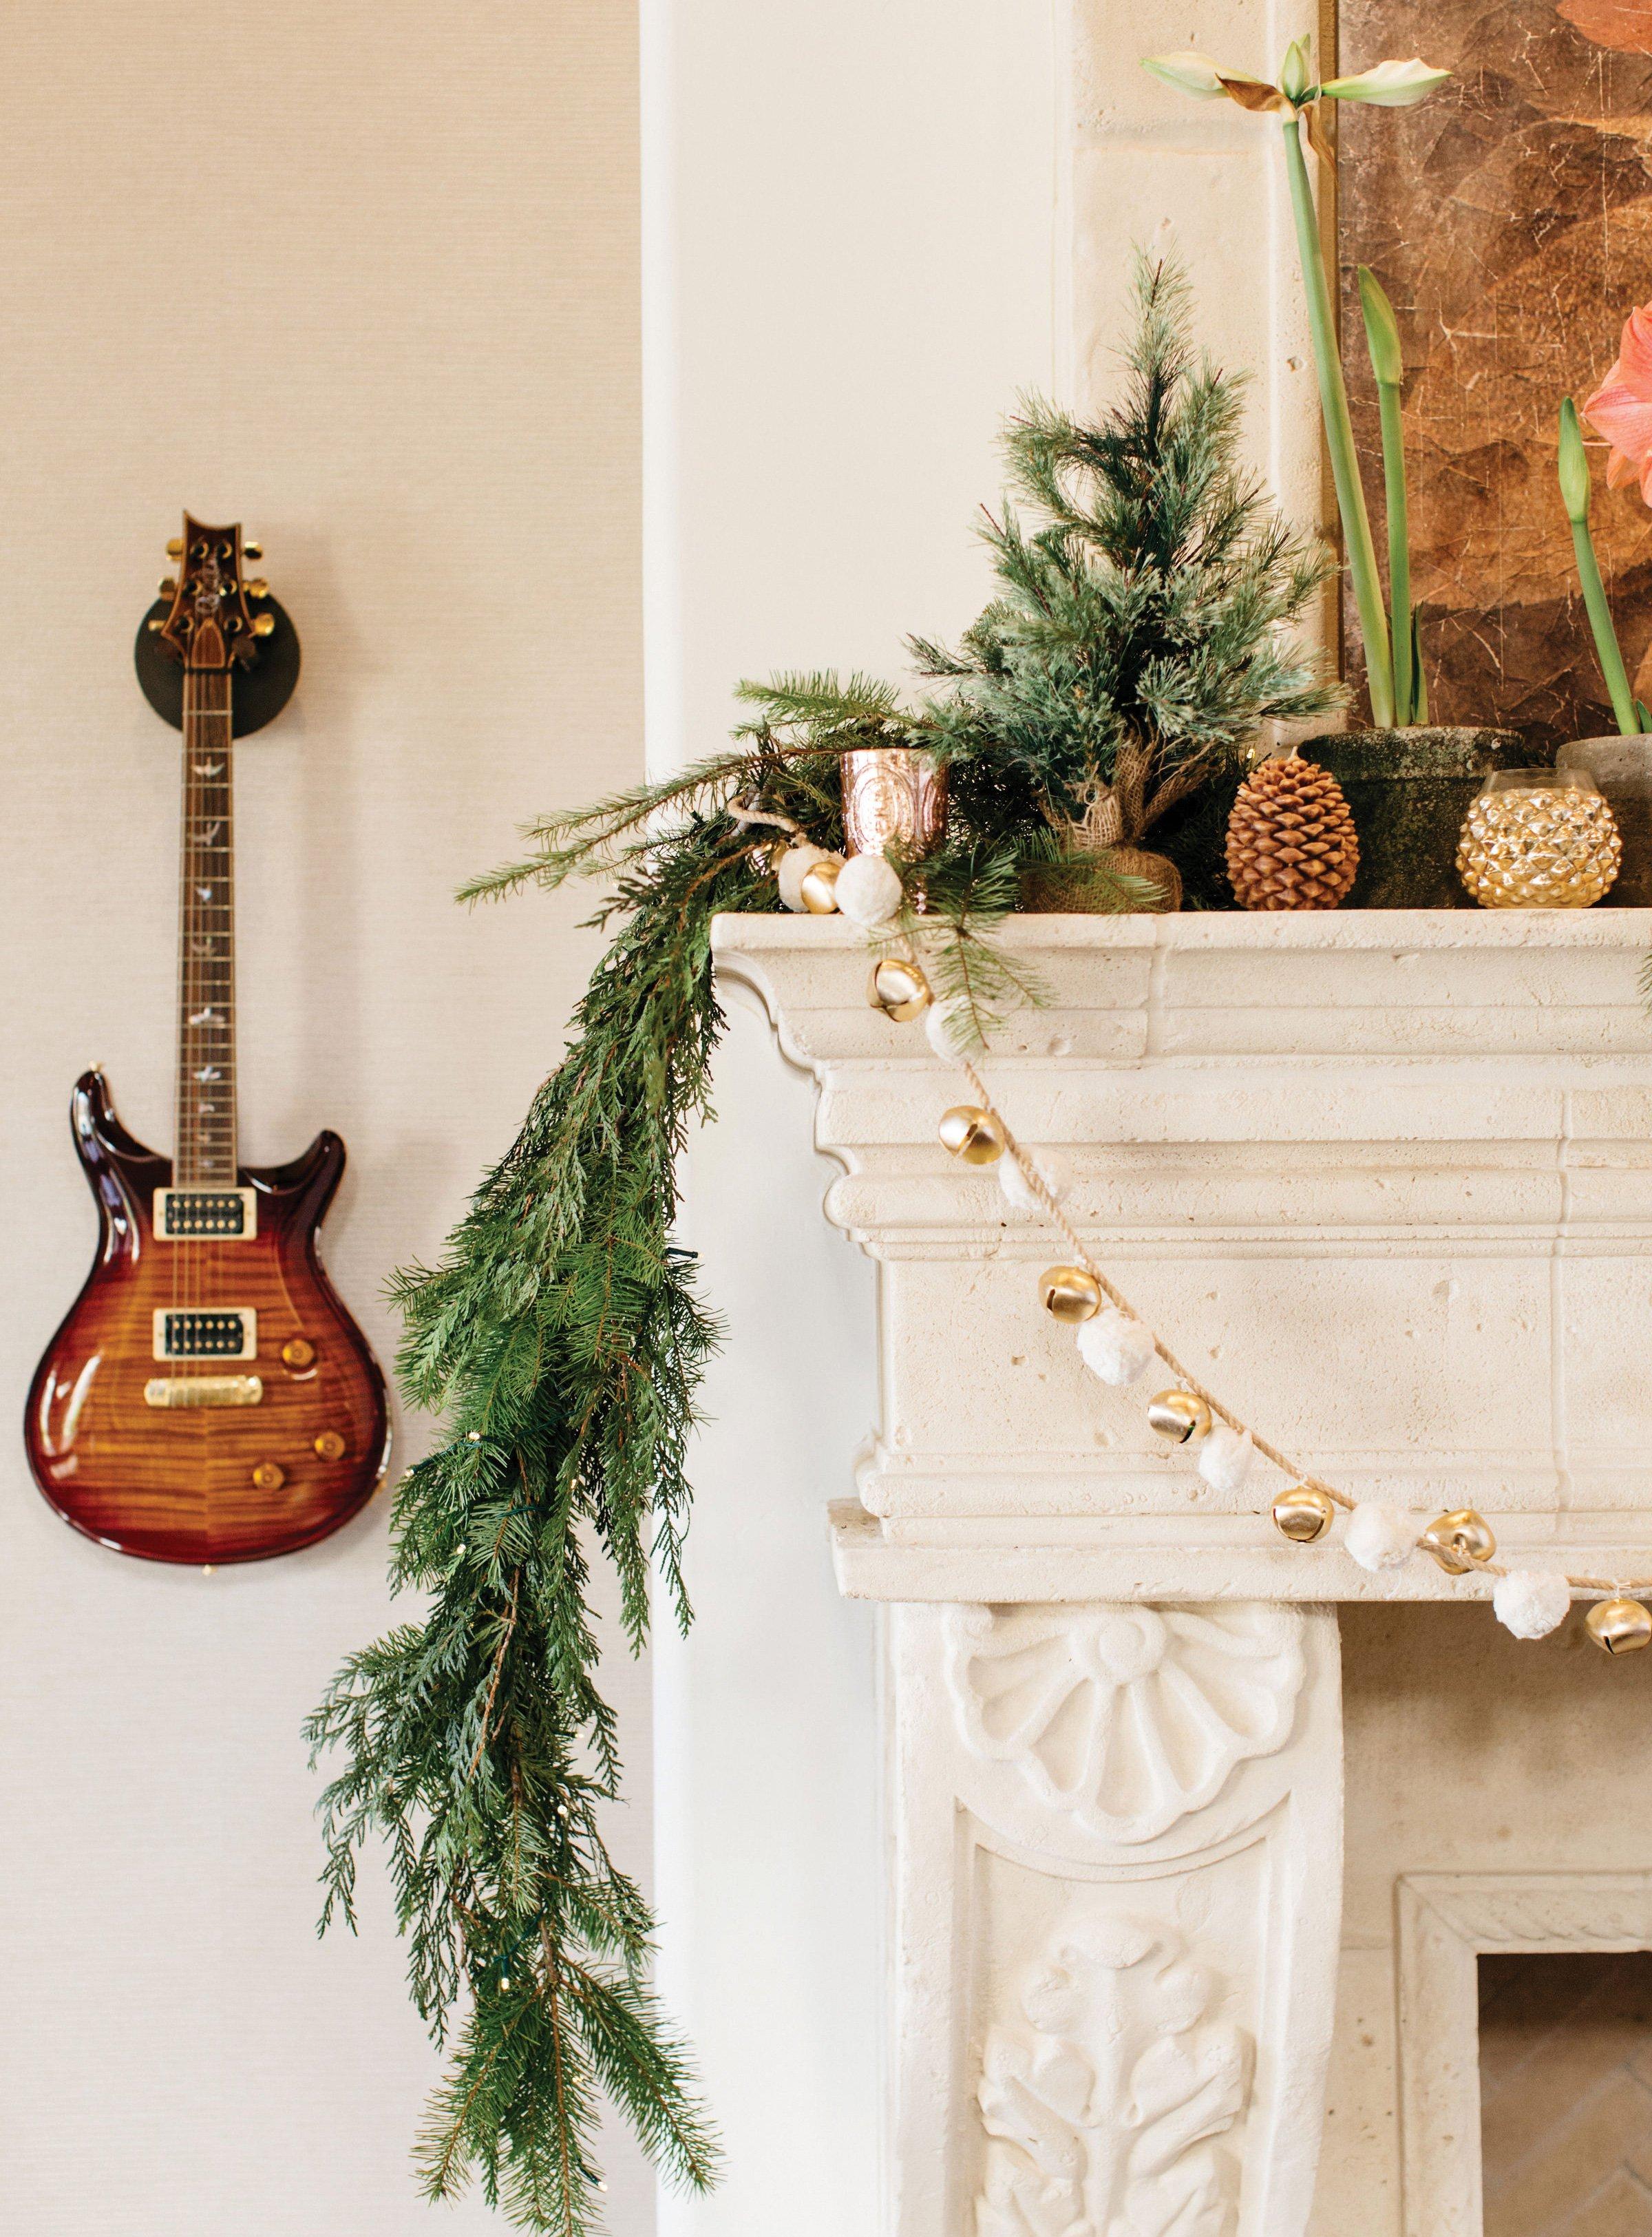 holiday decor pro professional interior designer musical decorations